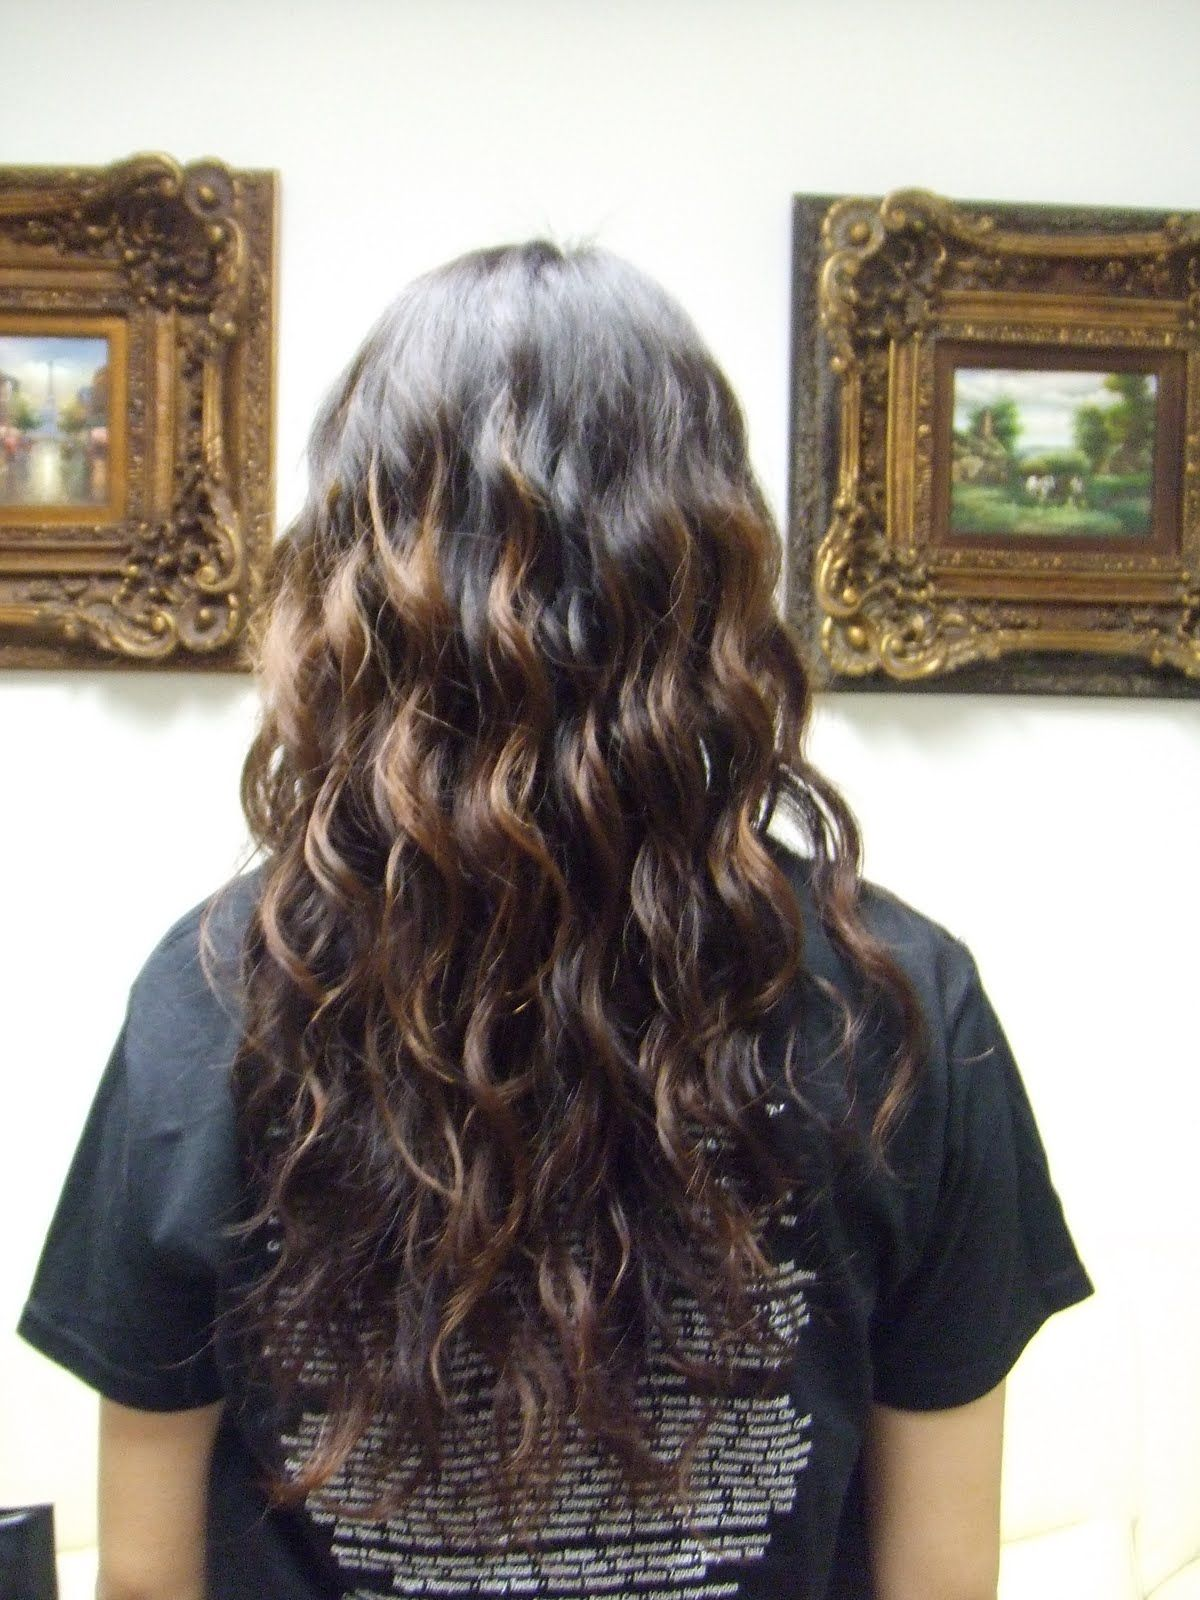 Hairstyle After Perm : a449c9b42bb2459625393f1ef5ca5fea.jpg